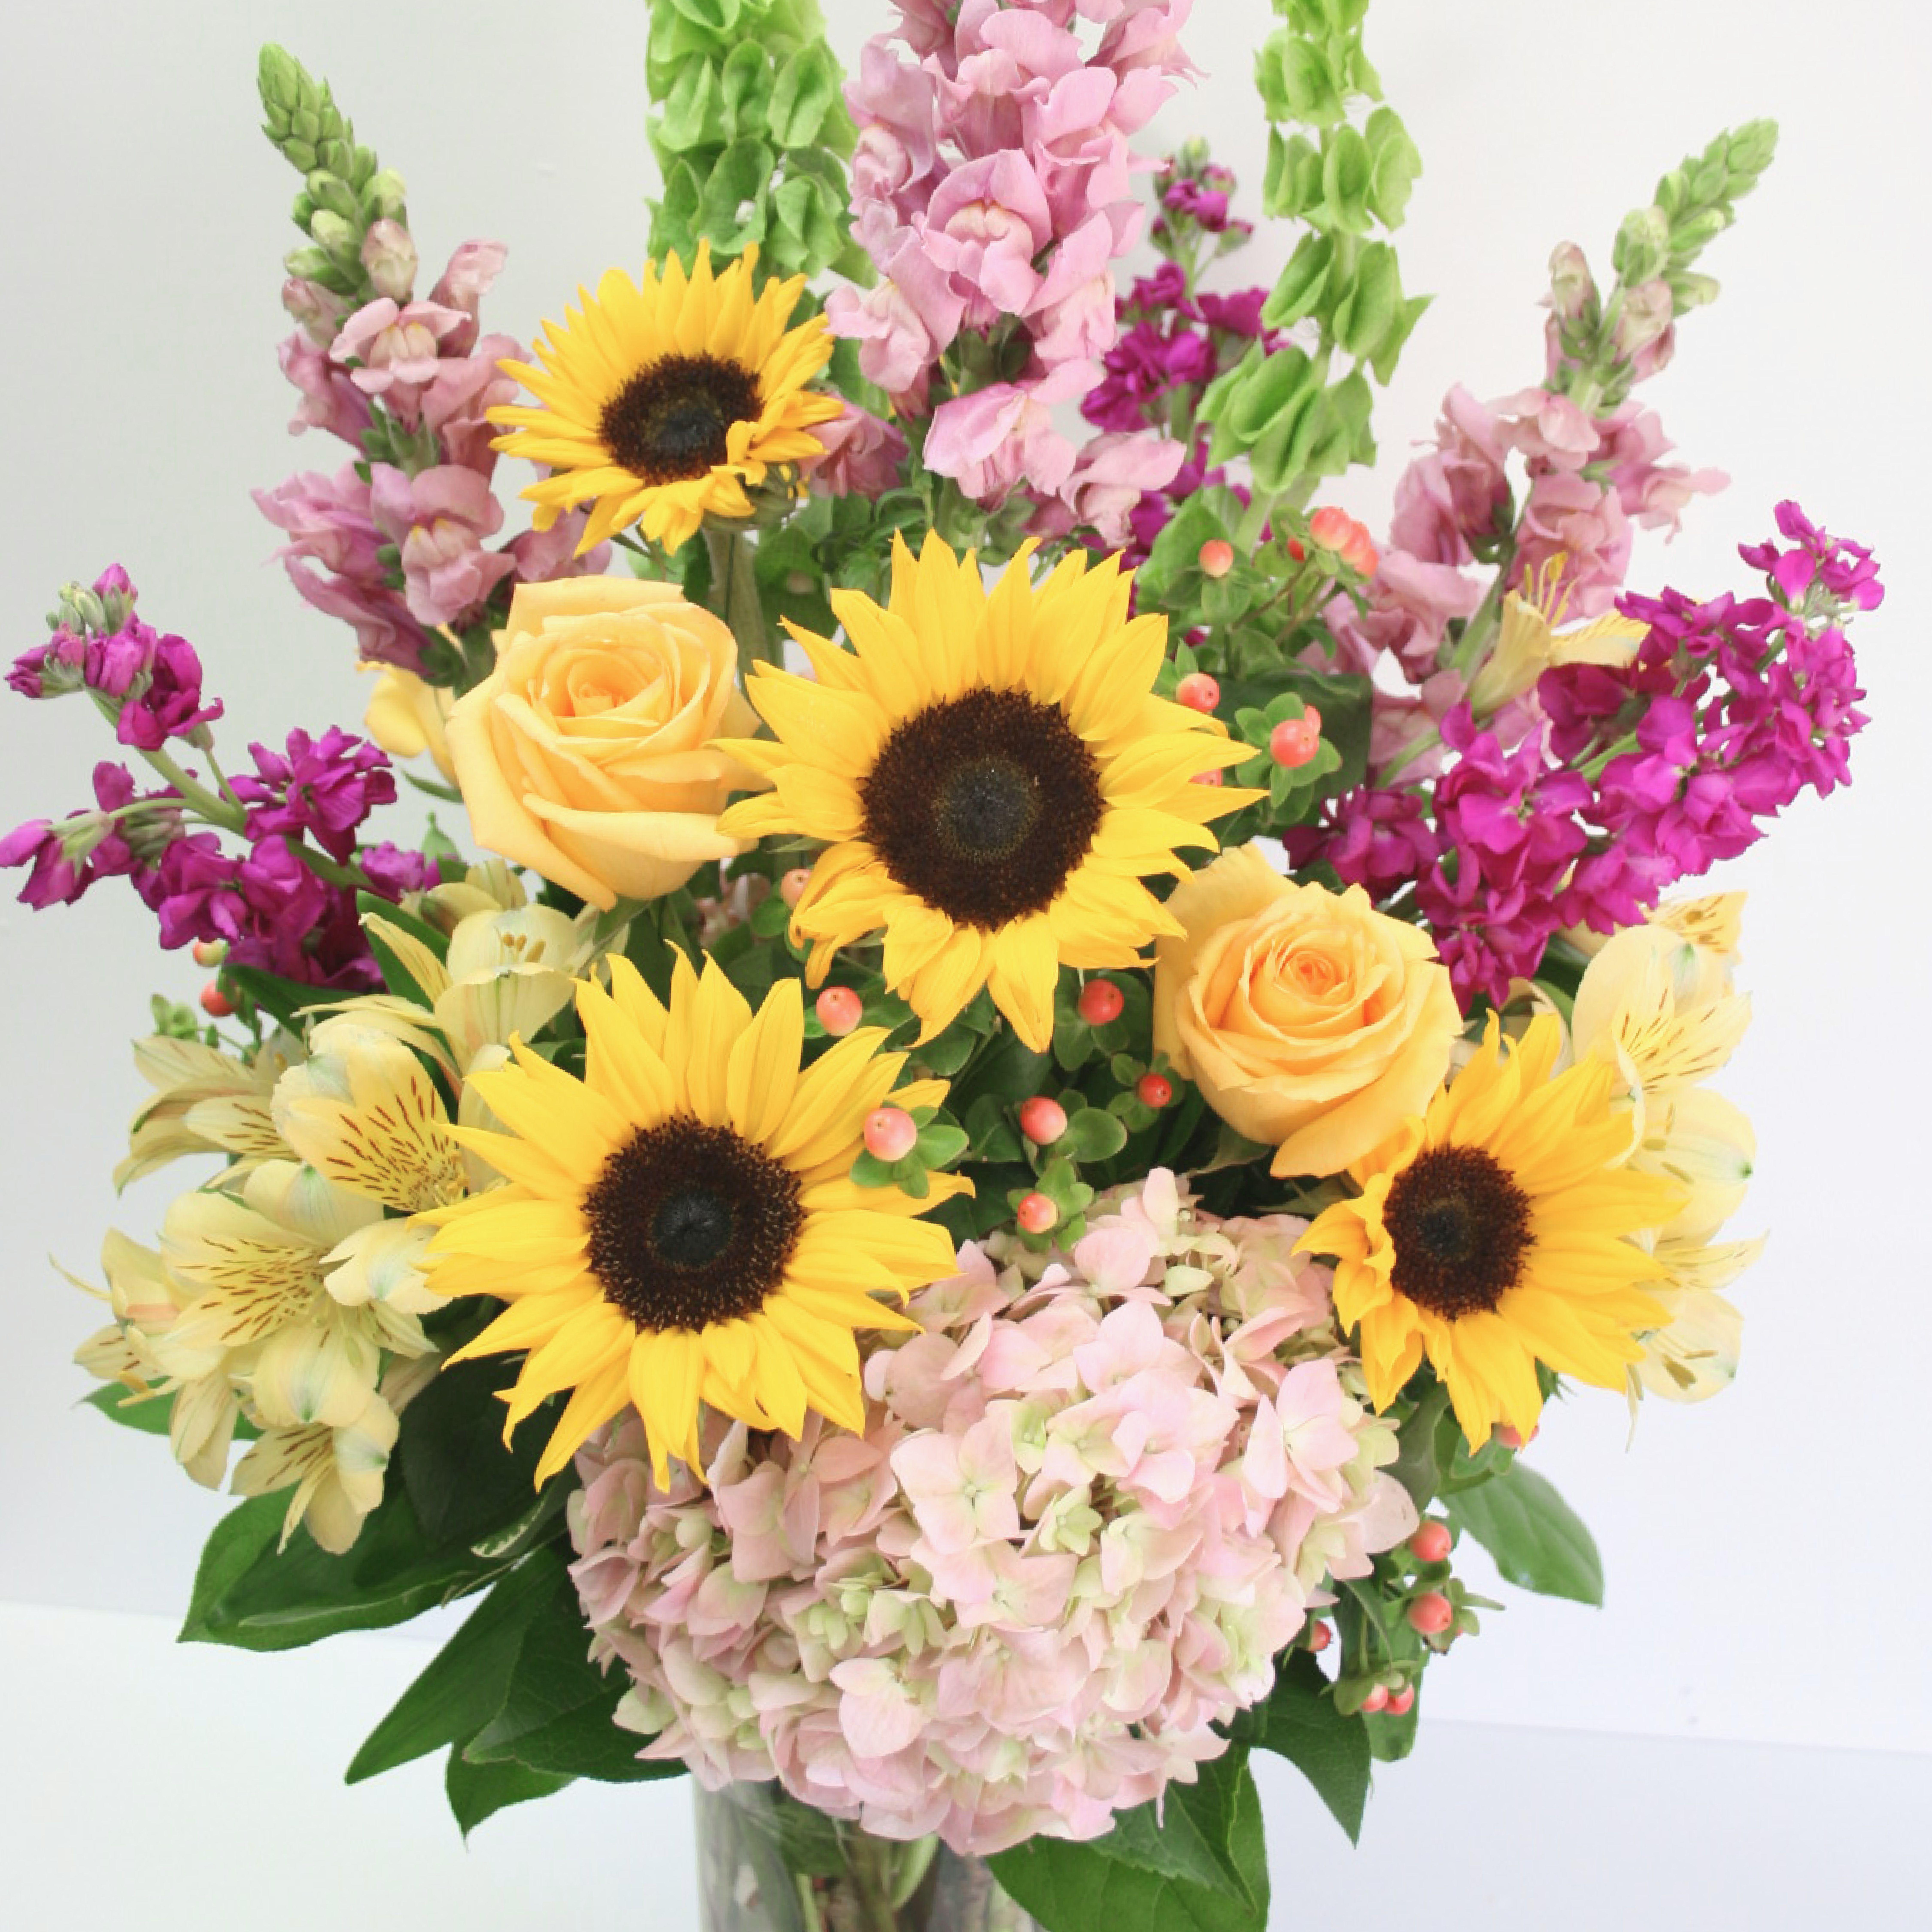 Mother's Day Flower Arrangement Freytag's Florist